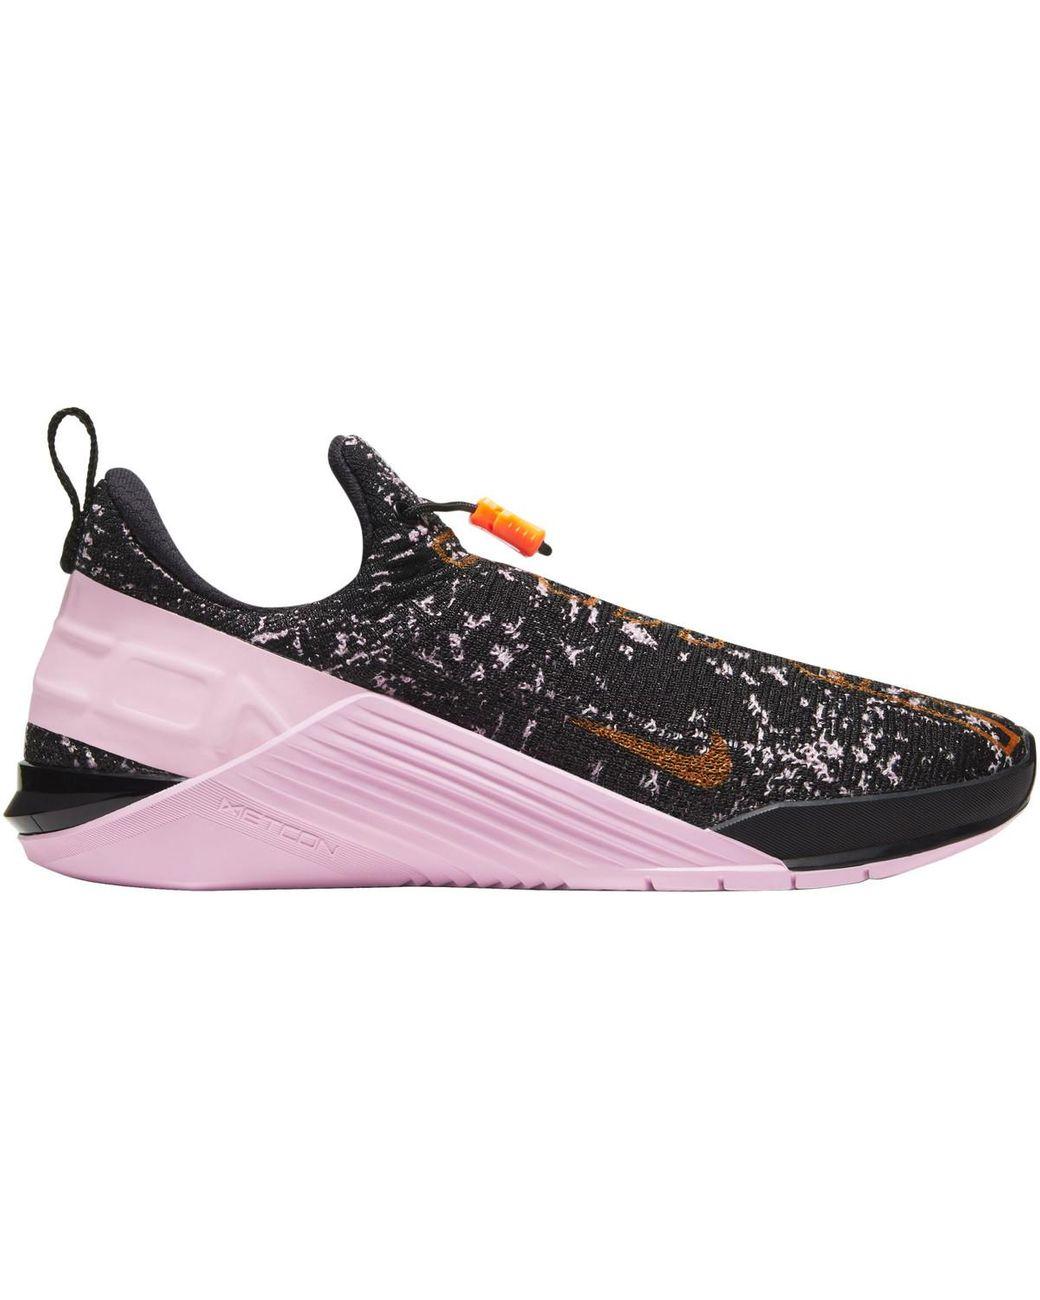 Chaussures React Metcon Women Nike en coloris Noir - Lyst